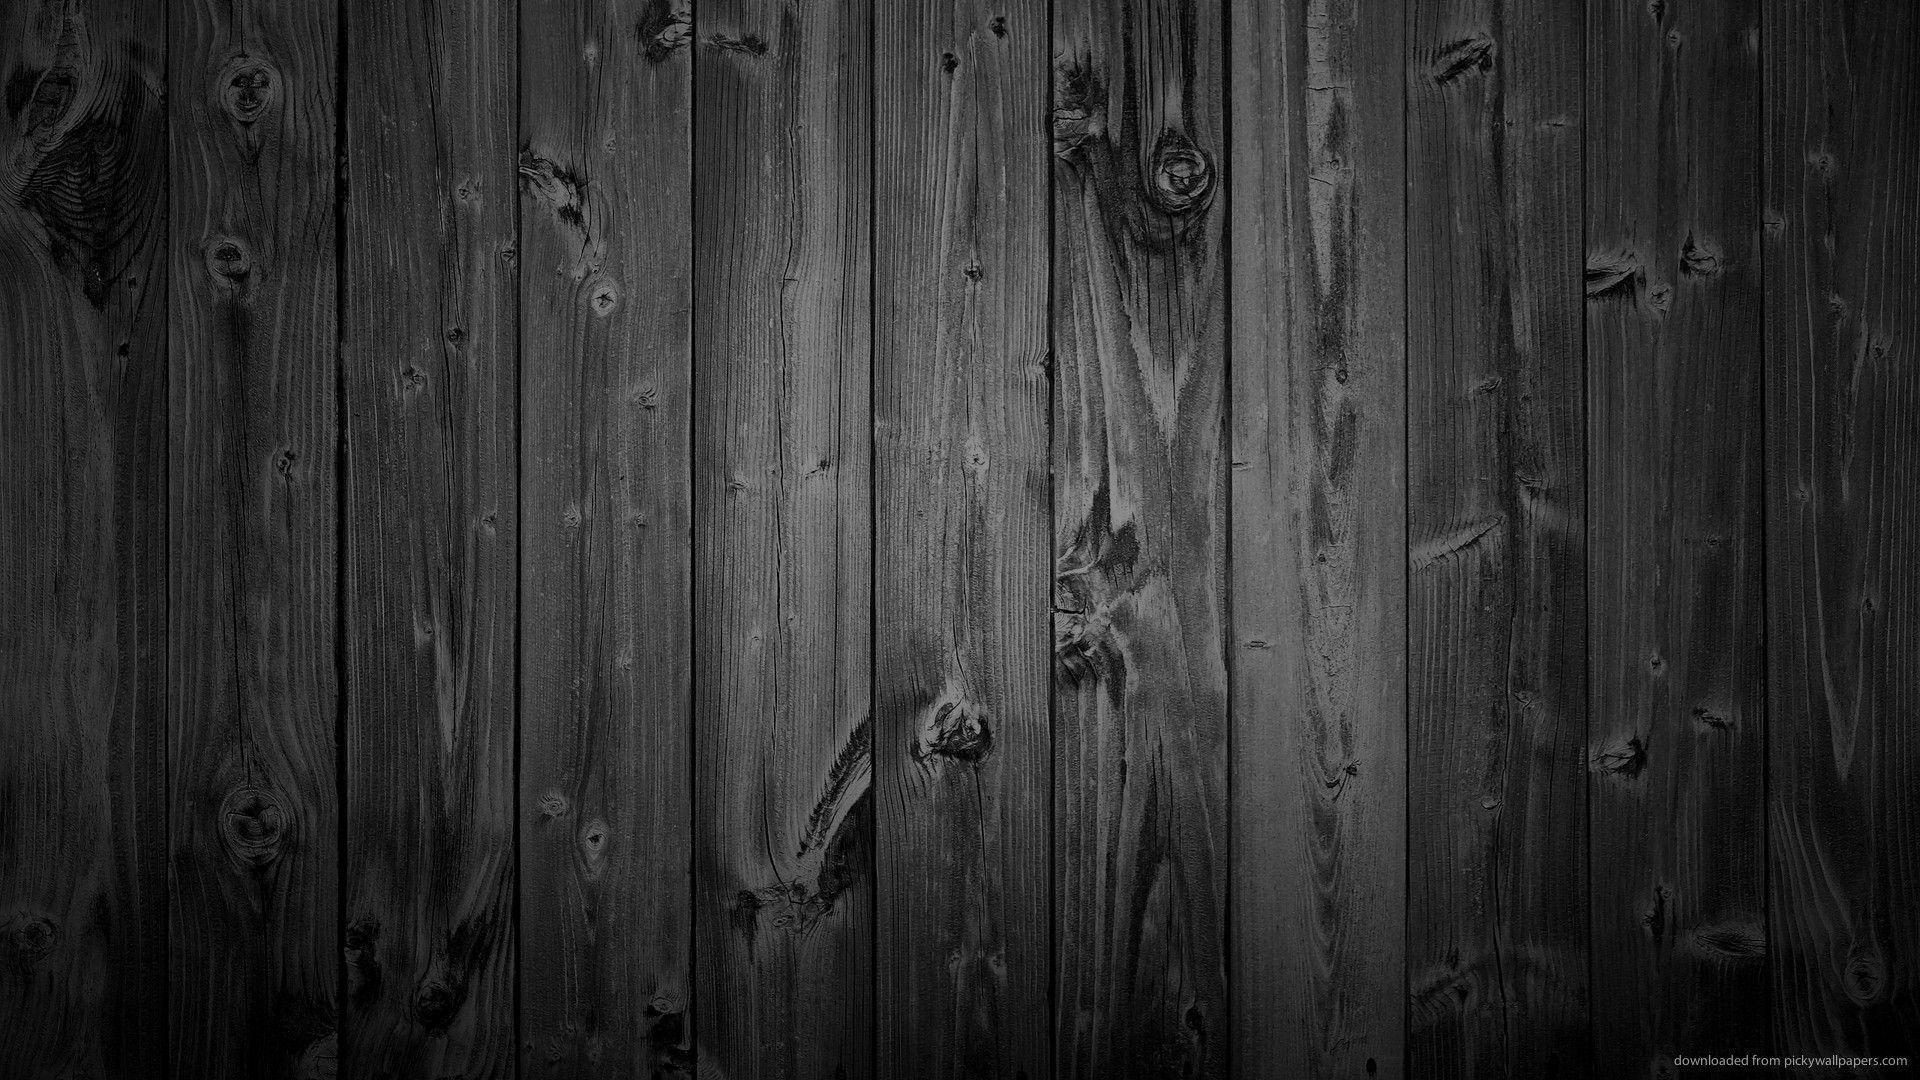 Hd wallpaper wood - Dark Wood Hd Wallpapers Hd Wallpapers Inn